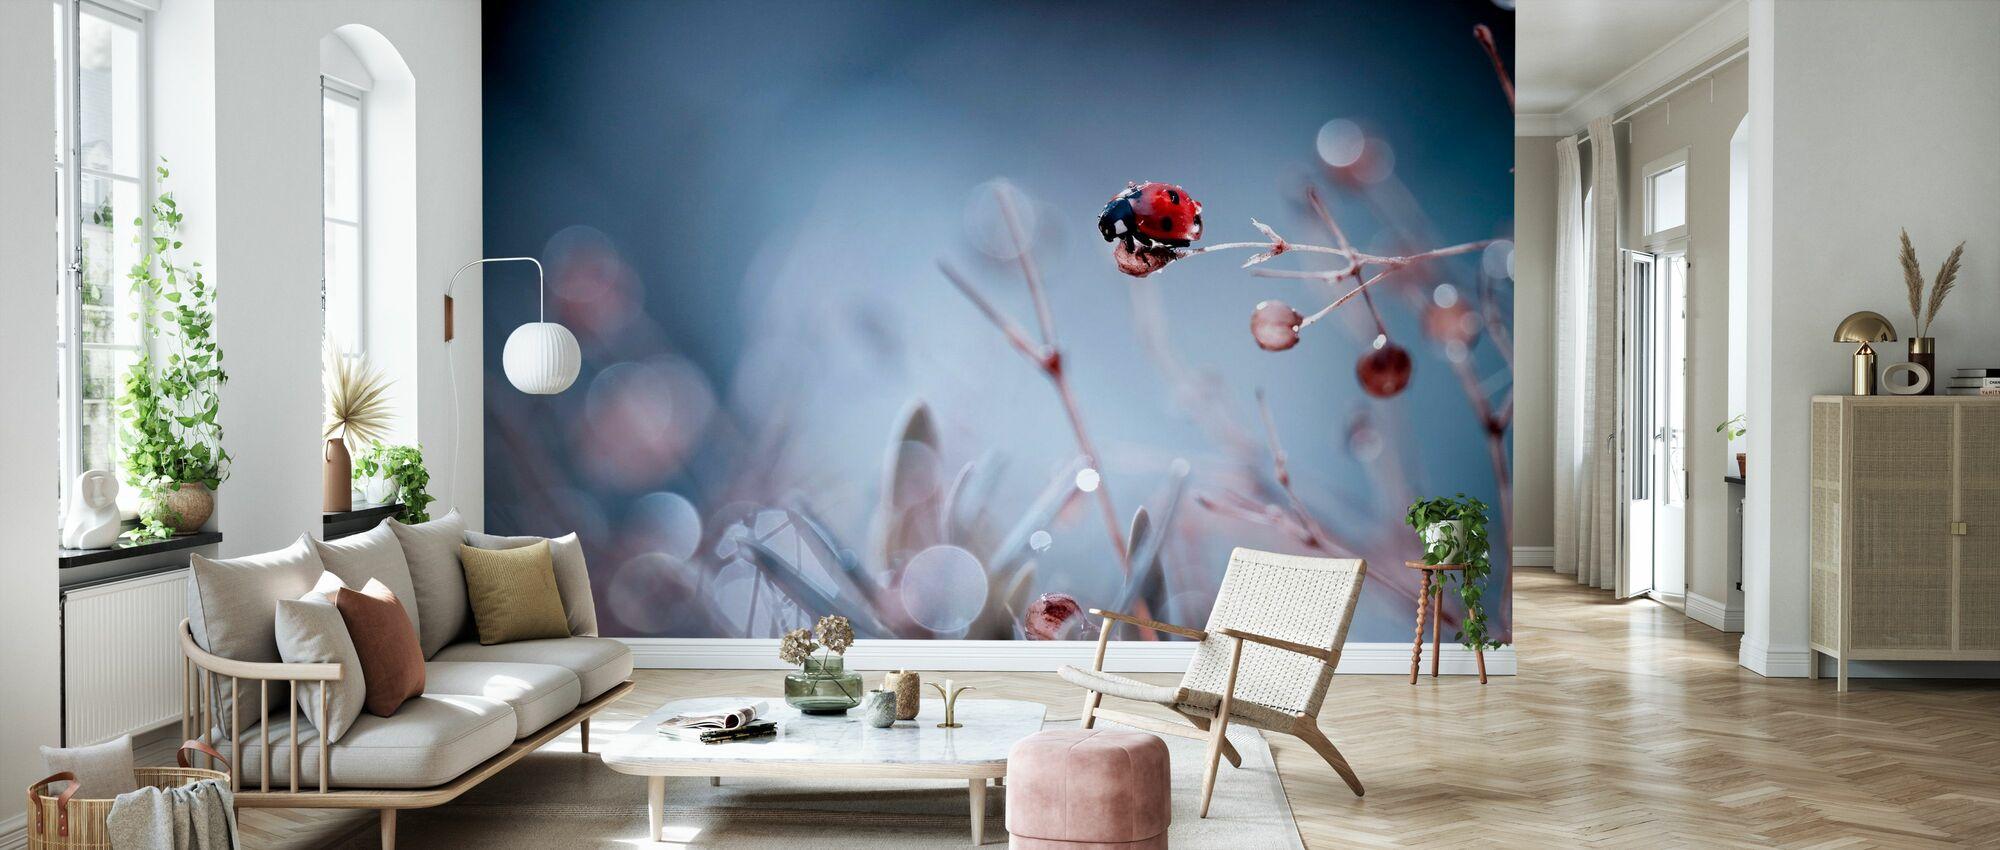 High Diving - Wallpaper - Living Room